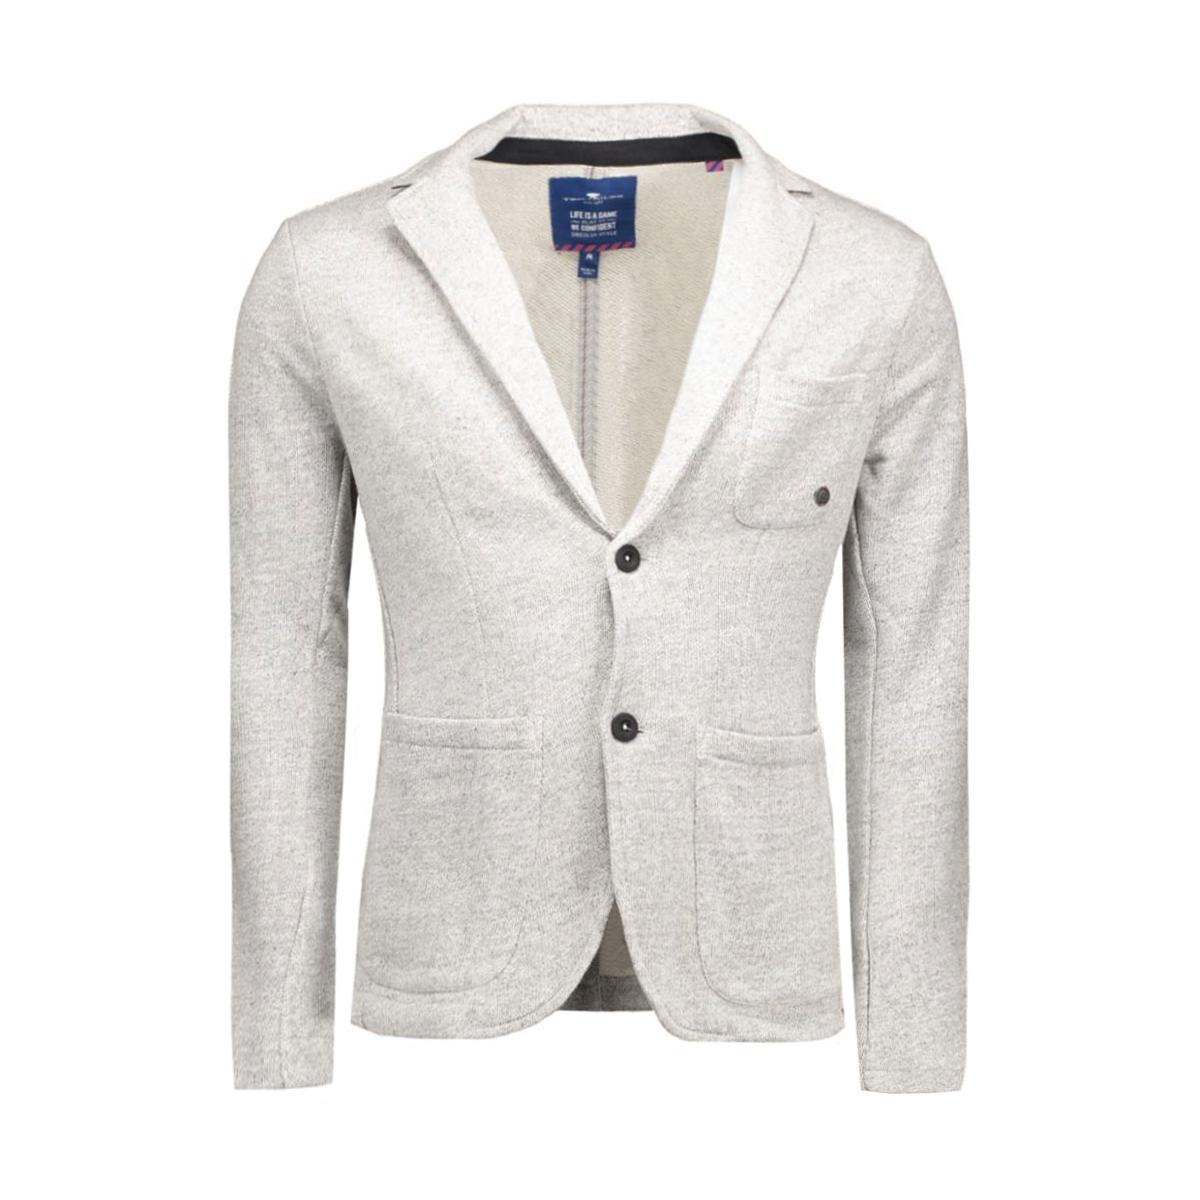 3922778.00.10 tom tailor colbert 8005